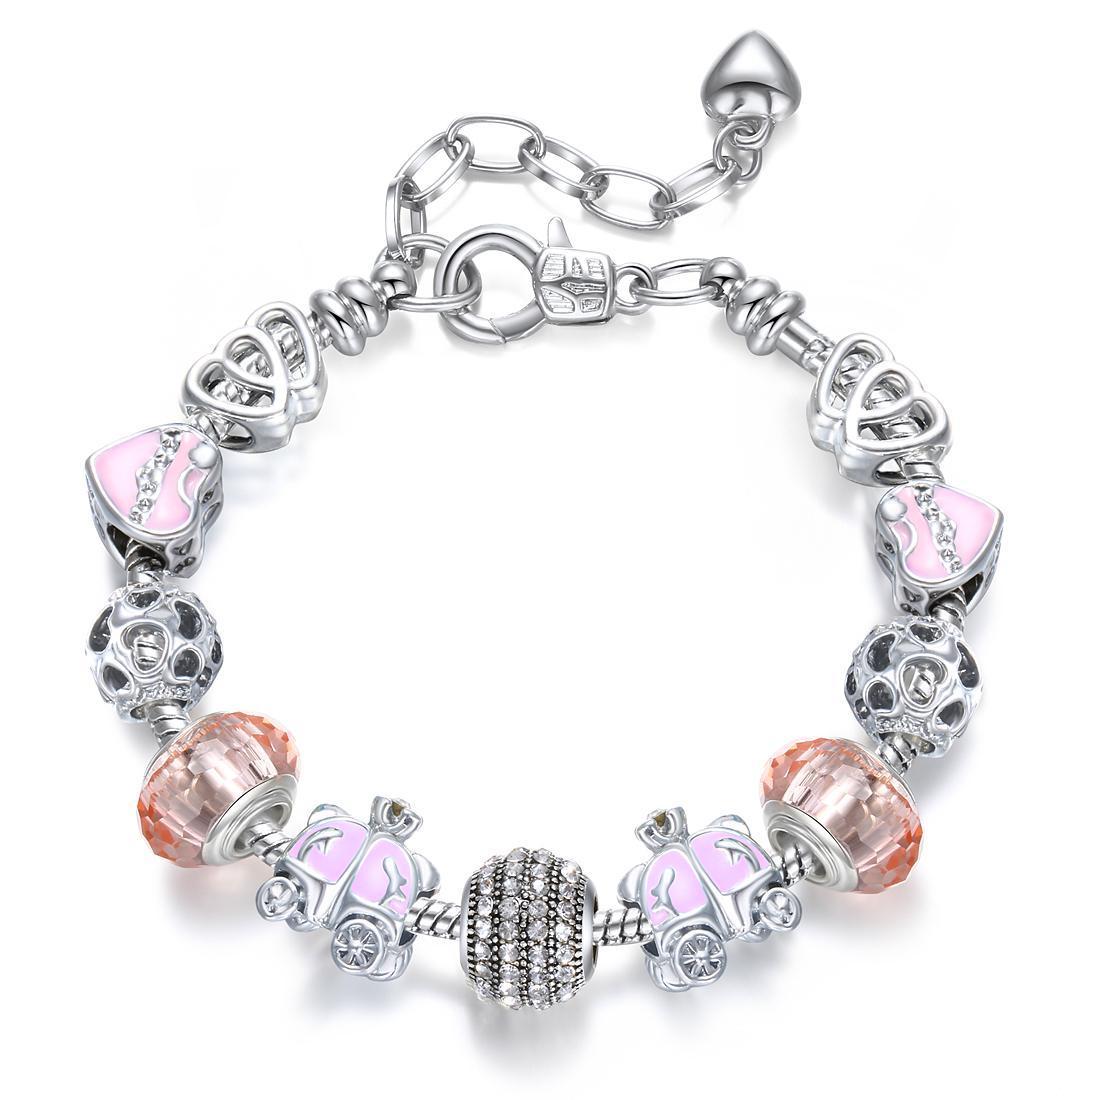 Toma de 925 granos de la plata gota oilCharm pulseras para las pulseras Europeo Mujeres brazaletes de plata Femme novia de la boda joyería fina